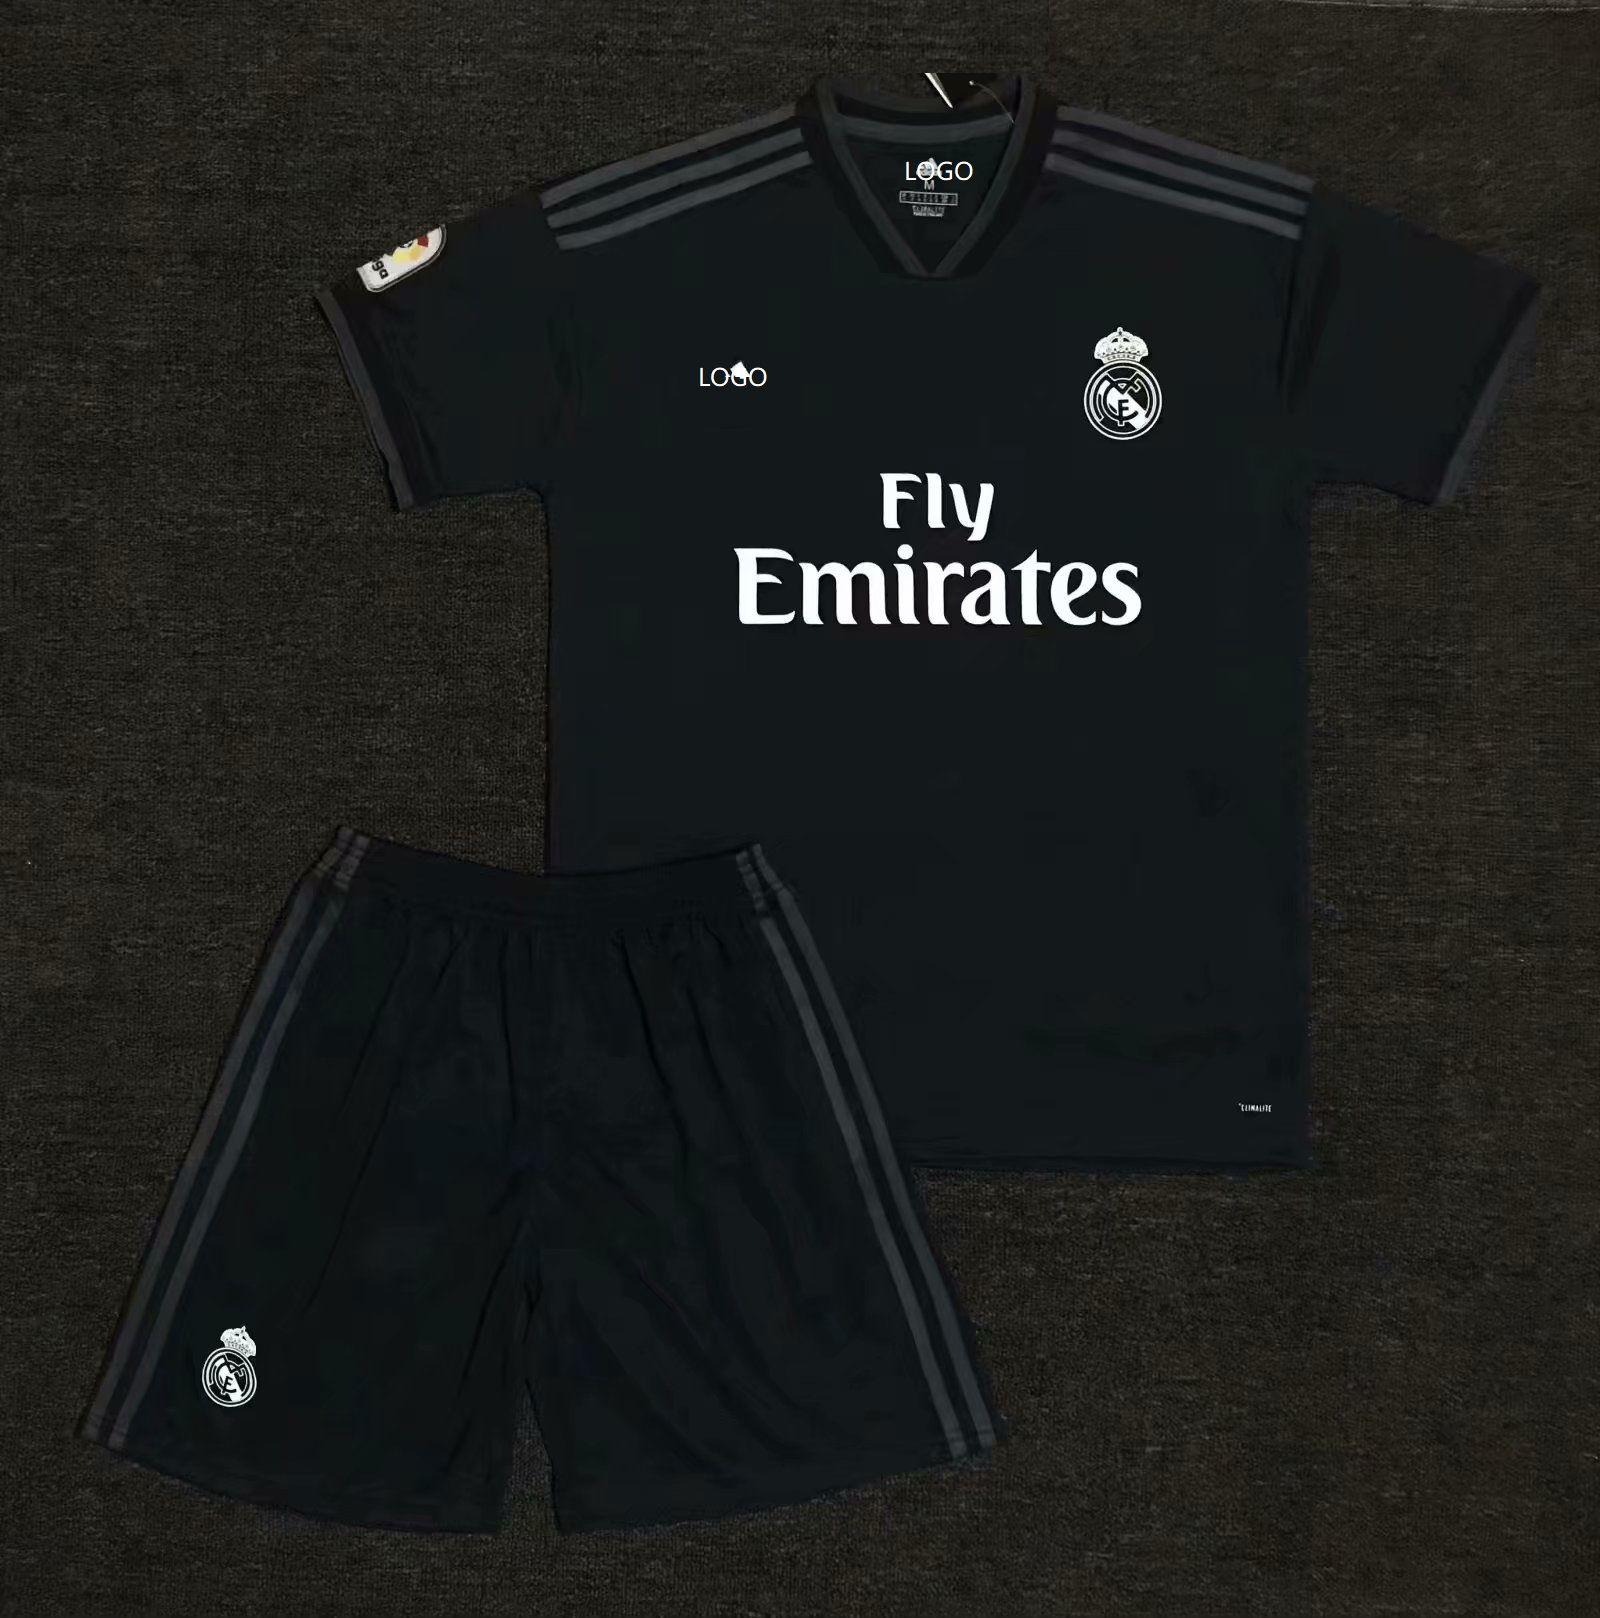 f0b6a0de4 2018 19 AAA Men Real Madrid Away Black Soccer Jersey Uniform Adult Football  Kits